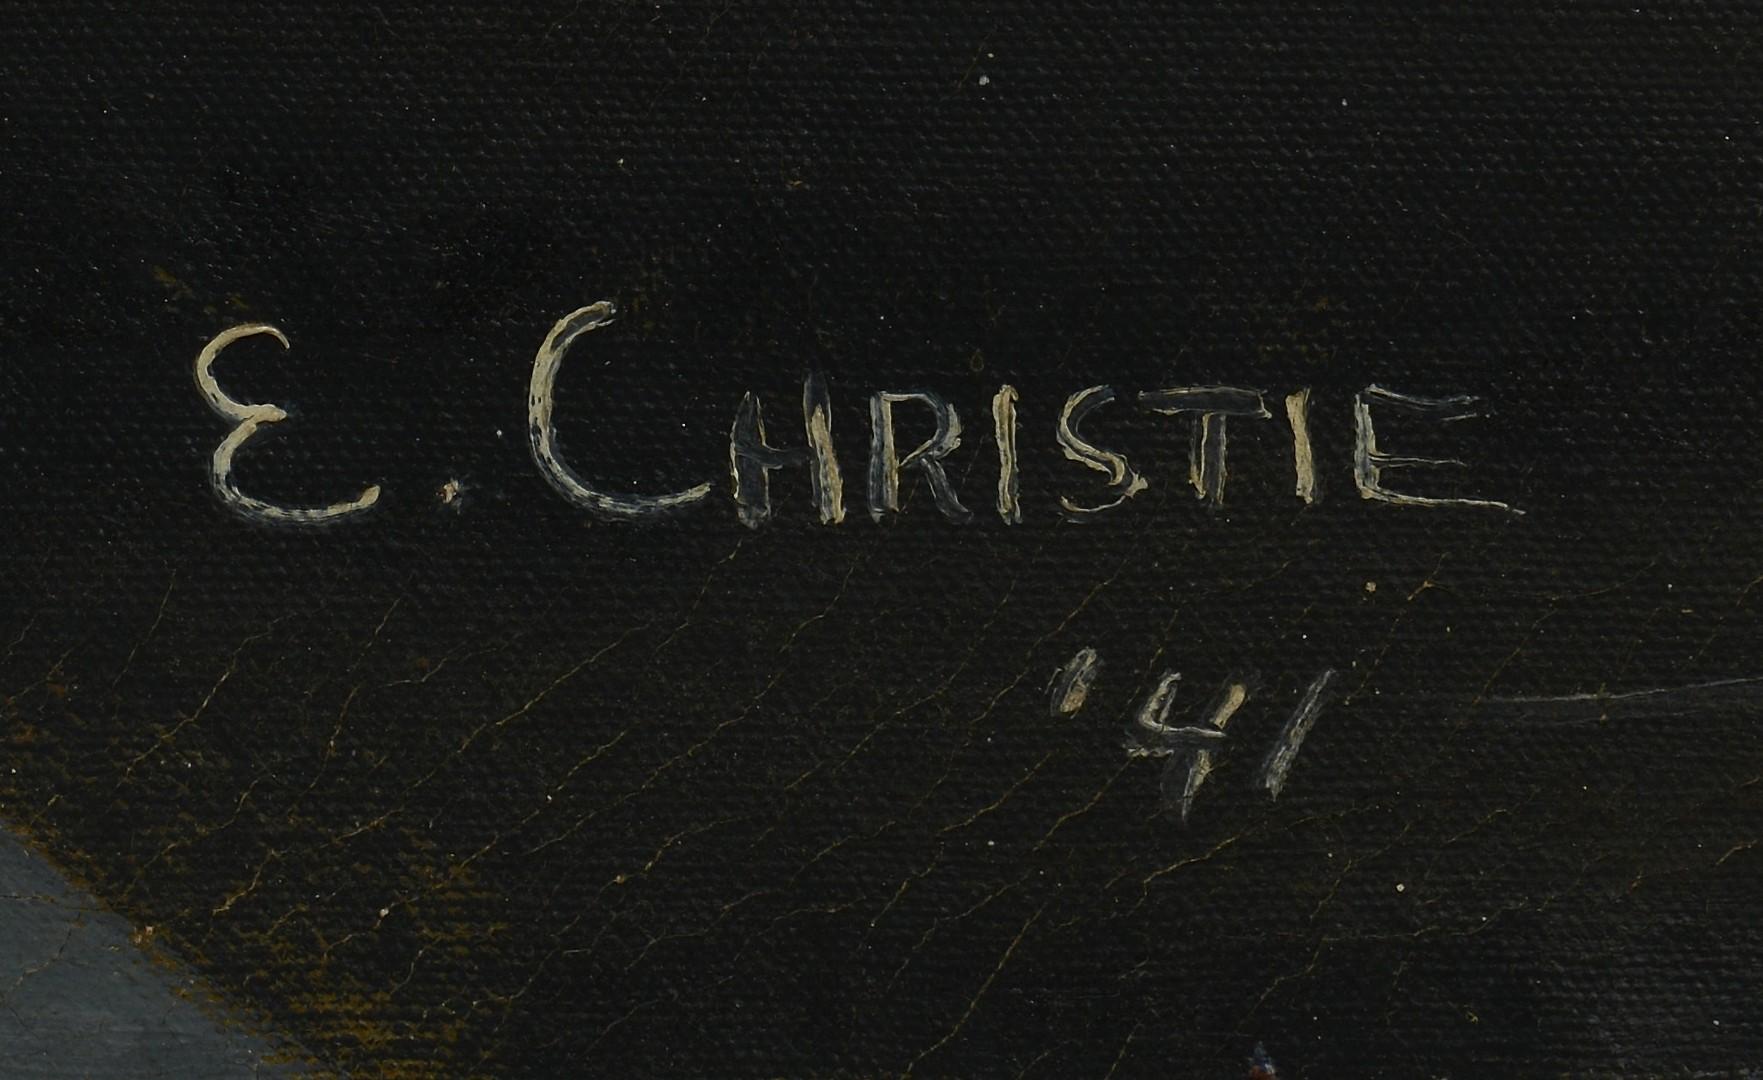 Lot 3594283: Abstract War Oil, E. Christie